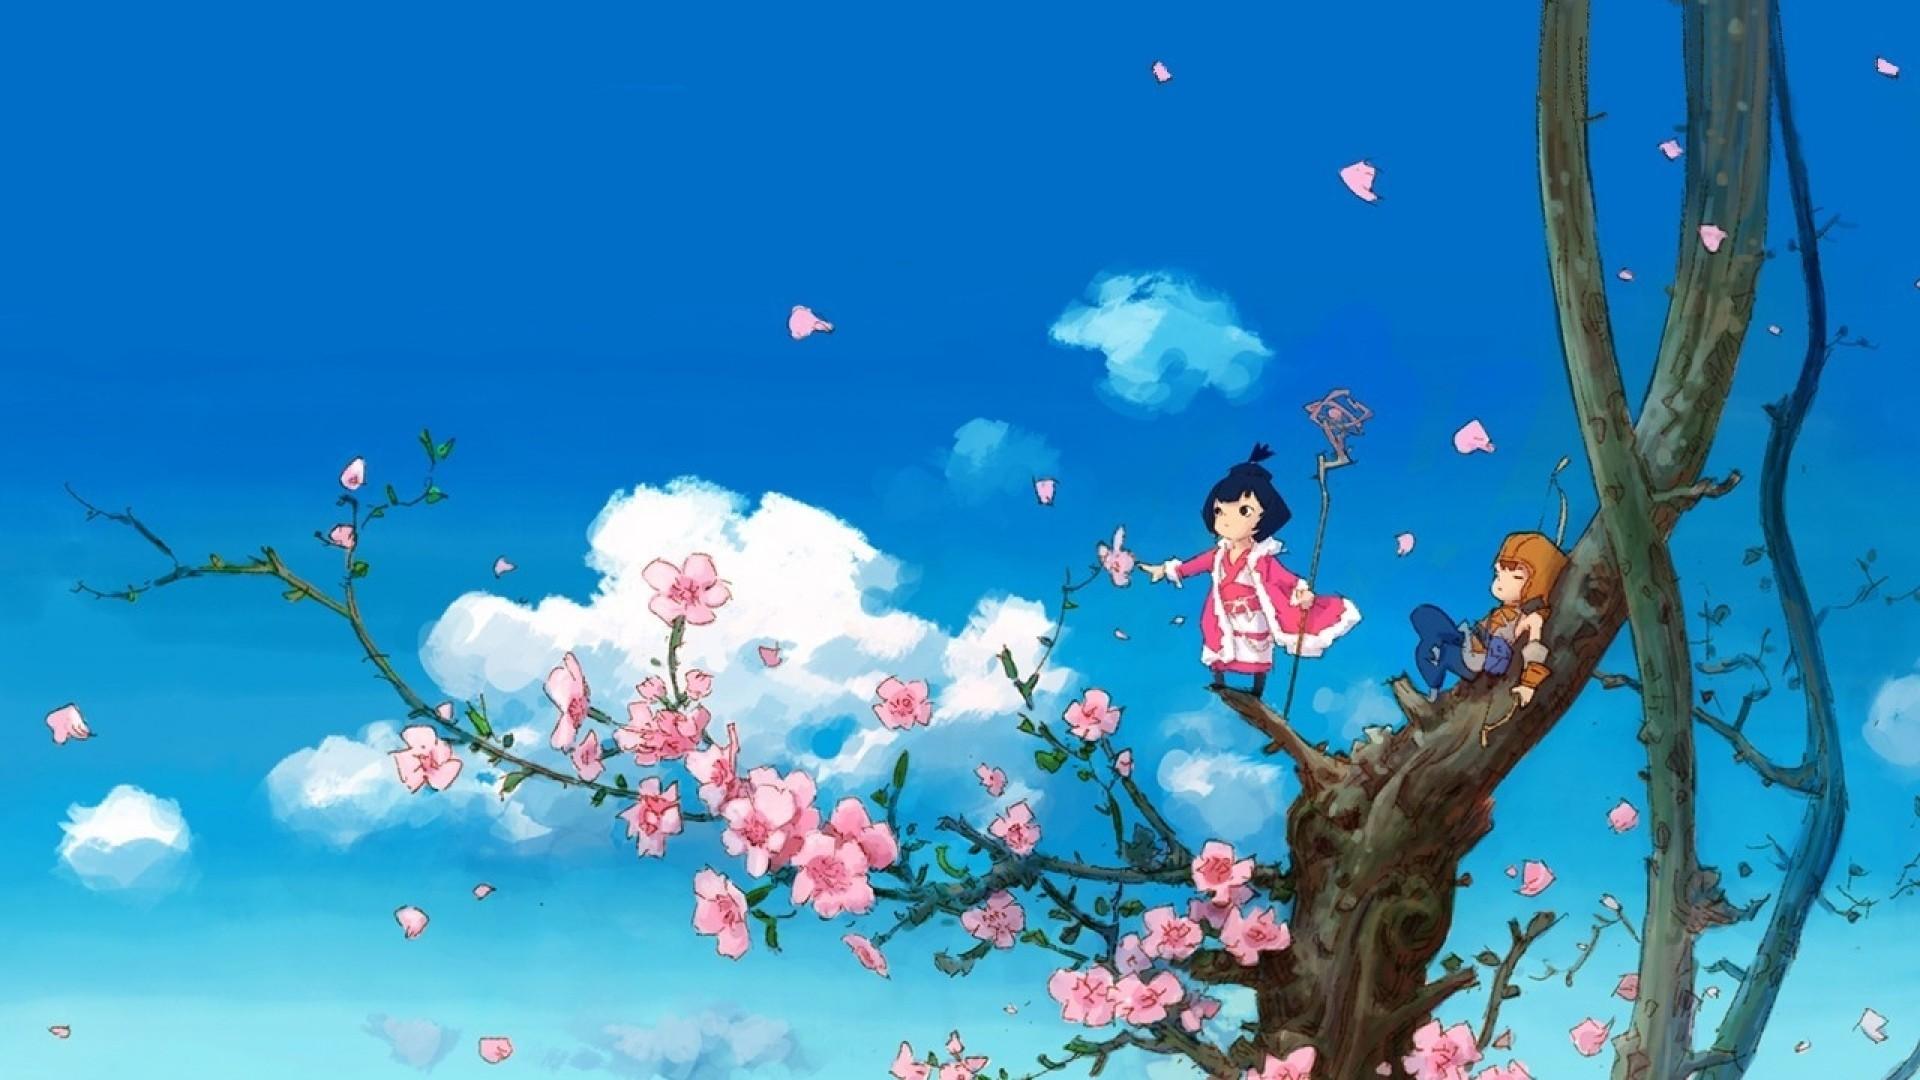 Wallpaper anime, tree, sky, clouds